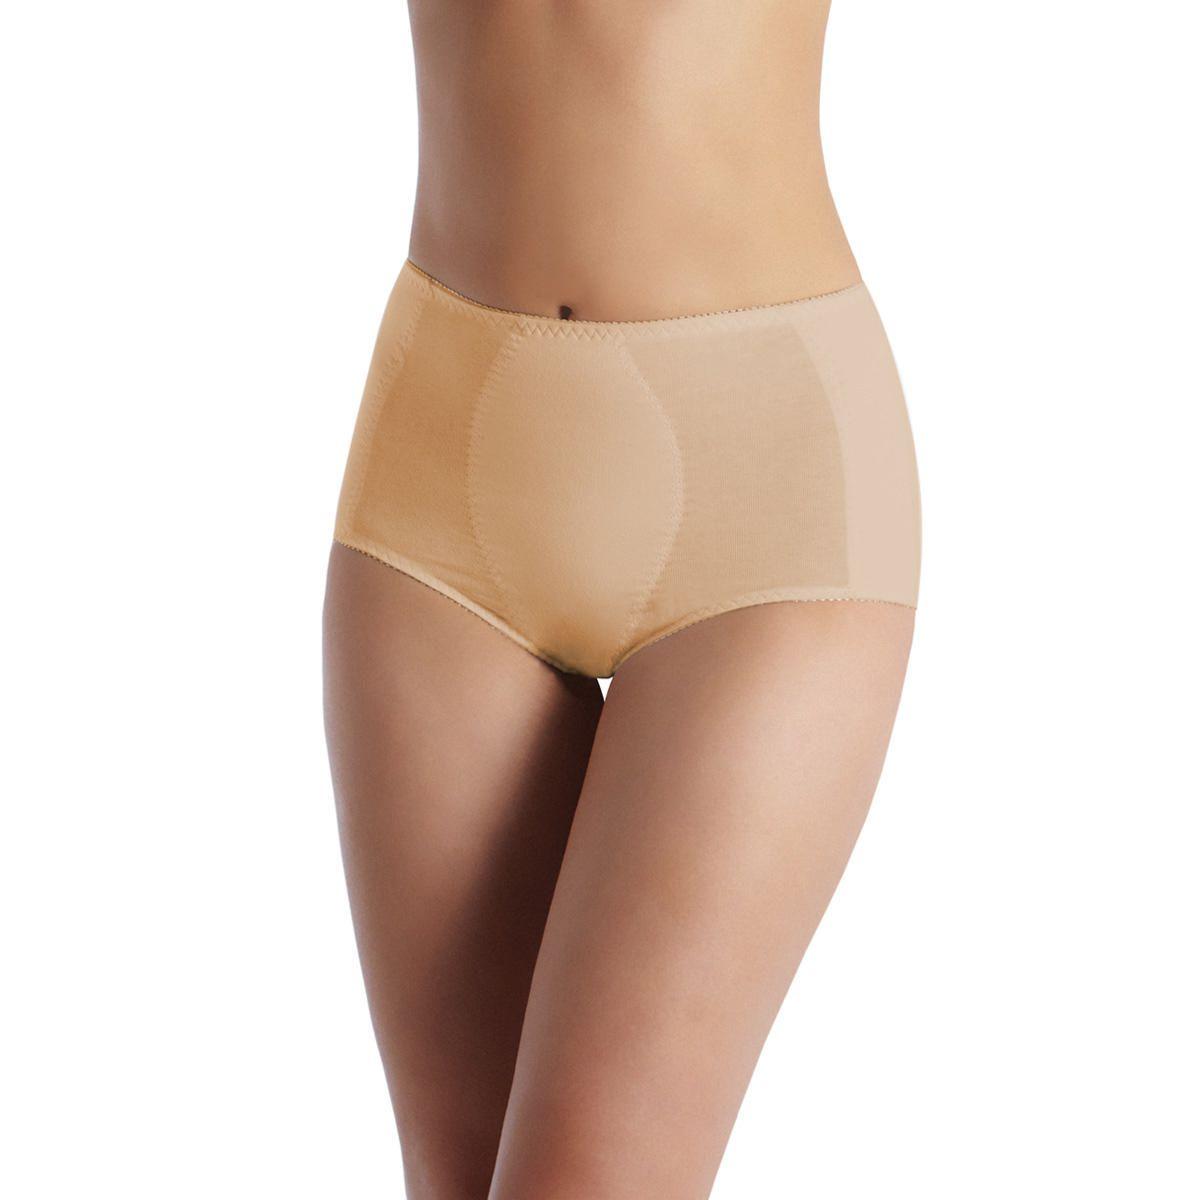 fc26e451fb30d Secret Women s 2pk Shapers Tummy And Hip Control Brief